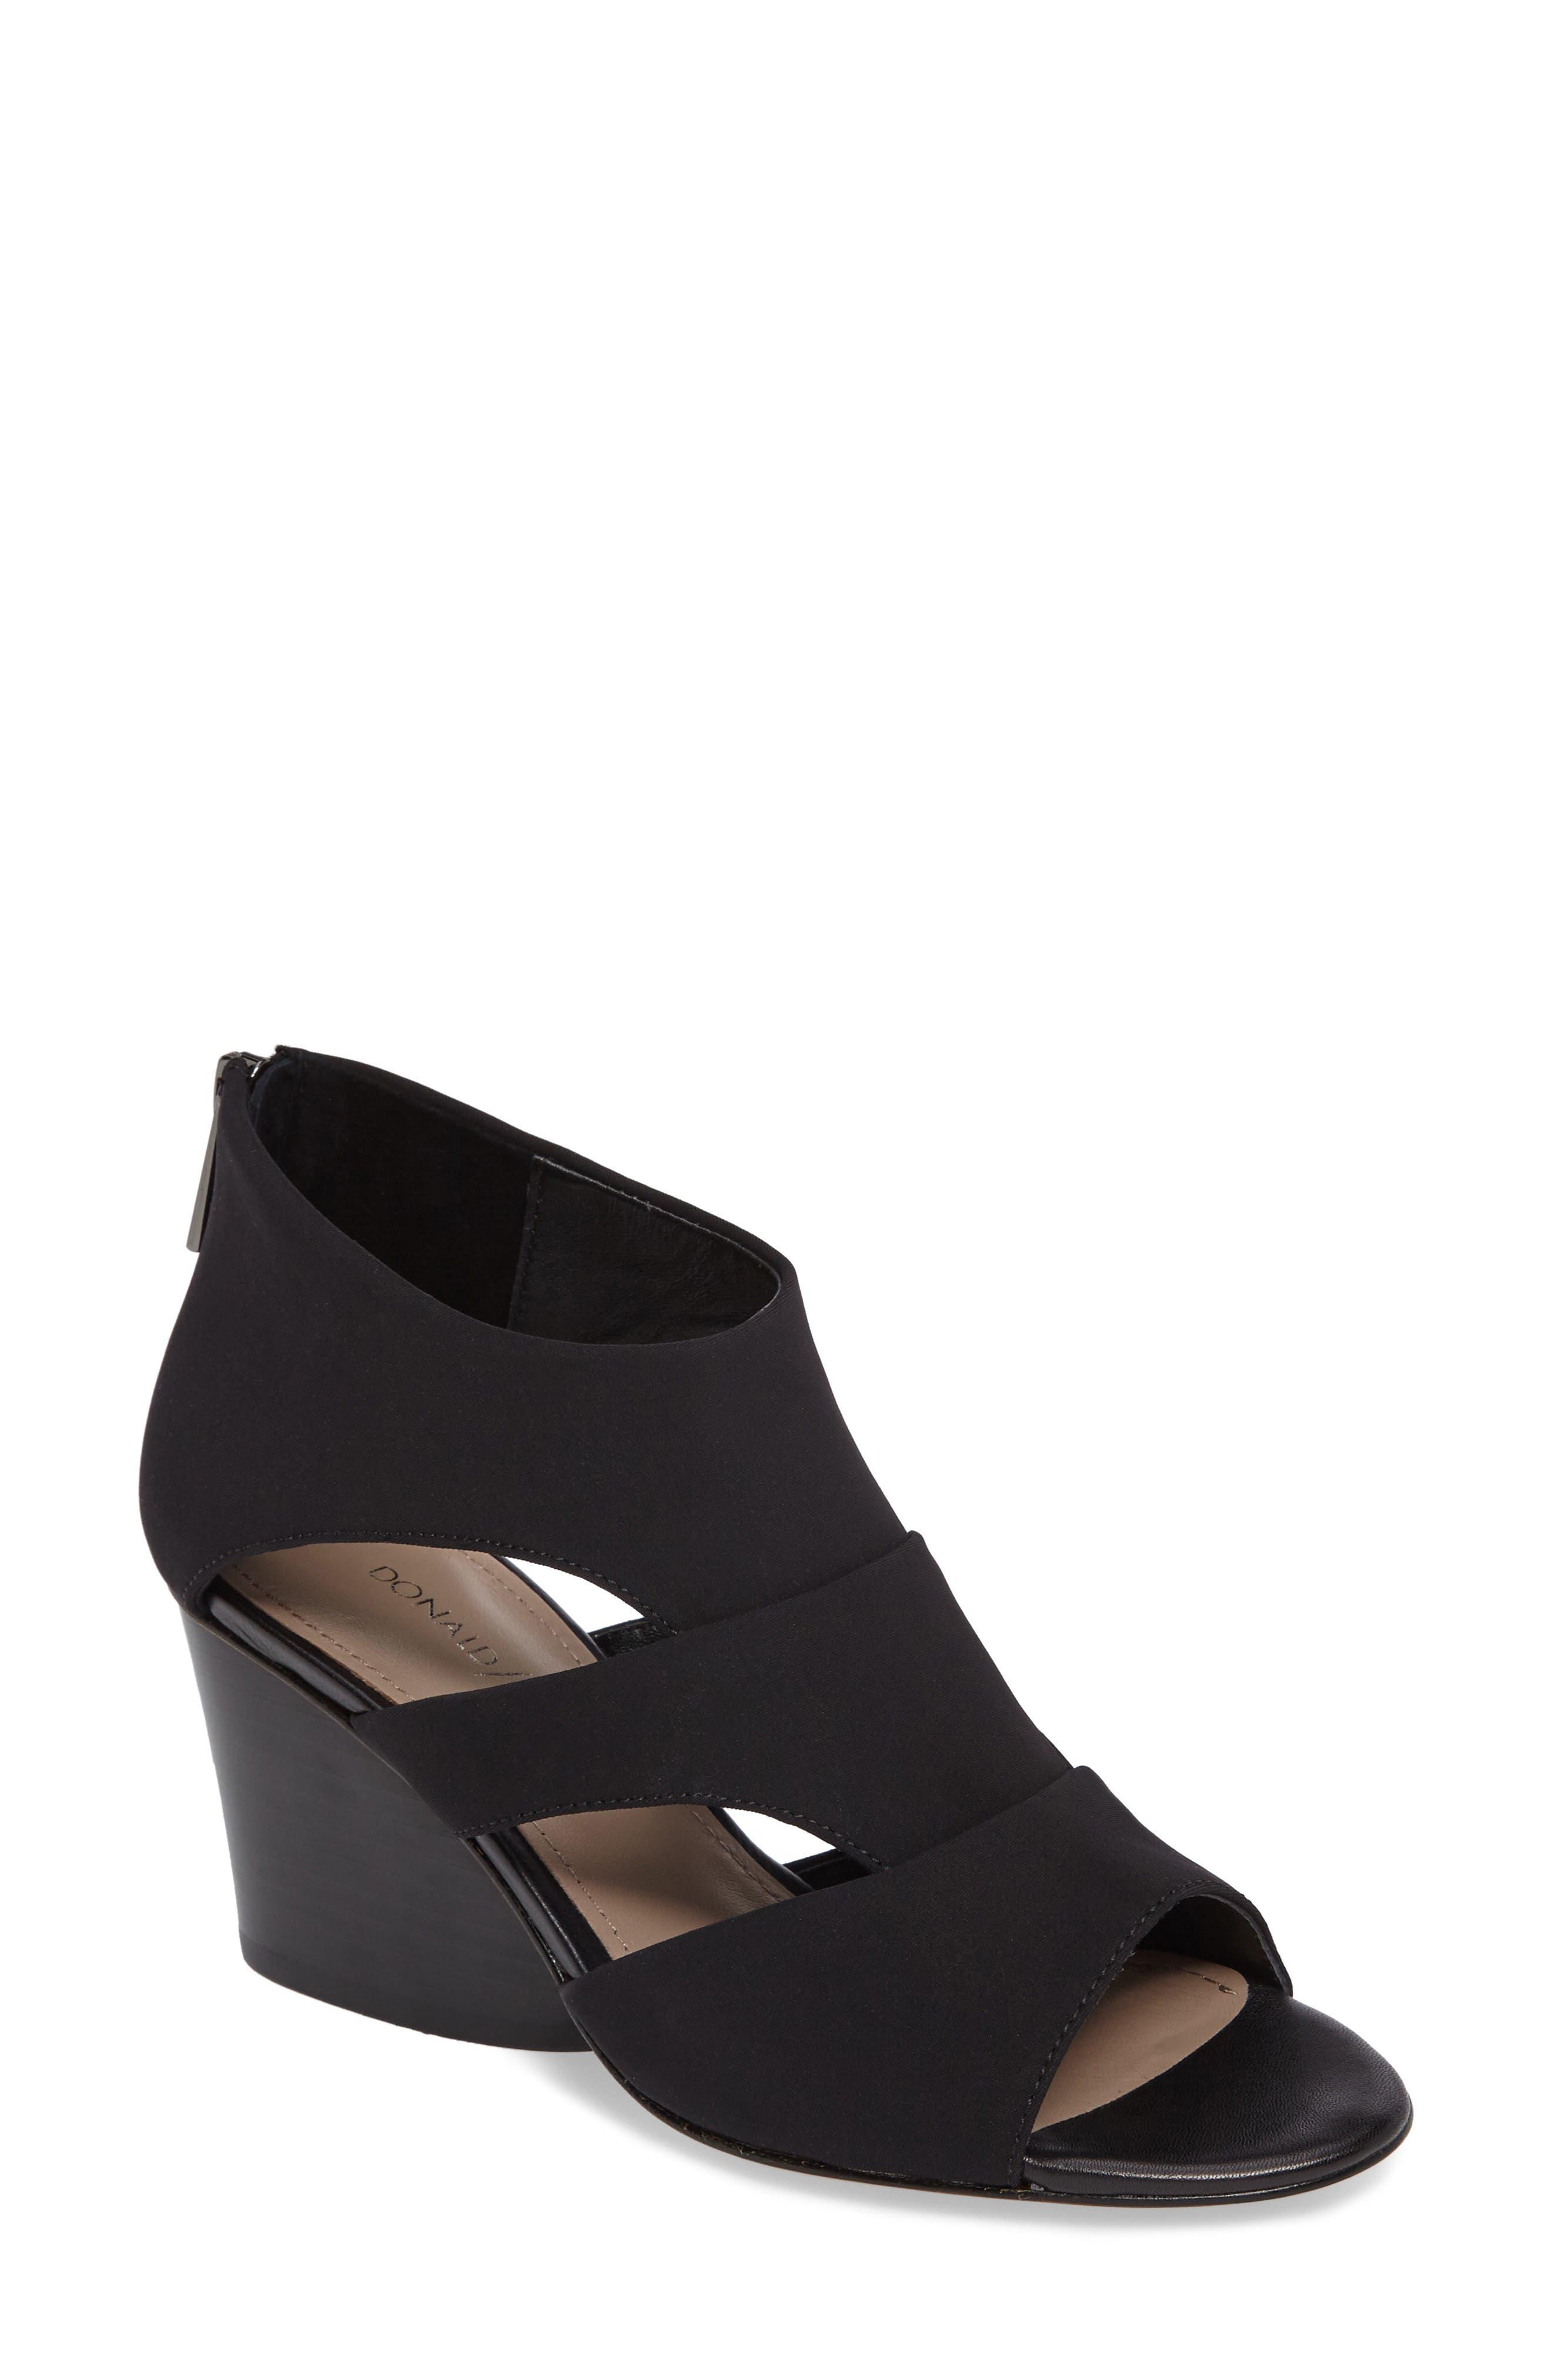 Main Image - Donald Pliner Jenkin Wedge Sandal (Women)